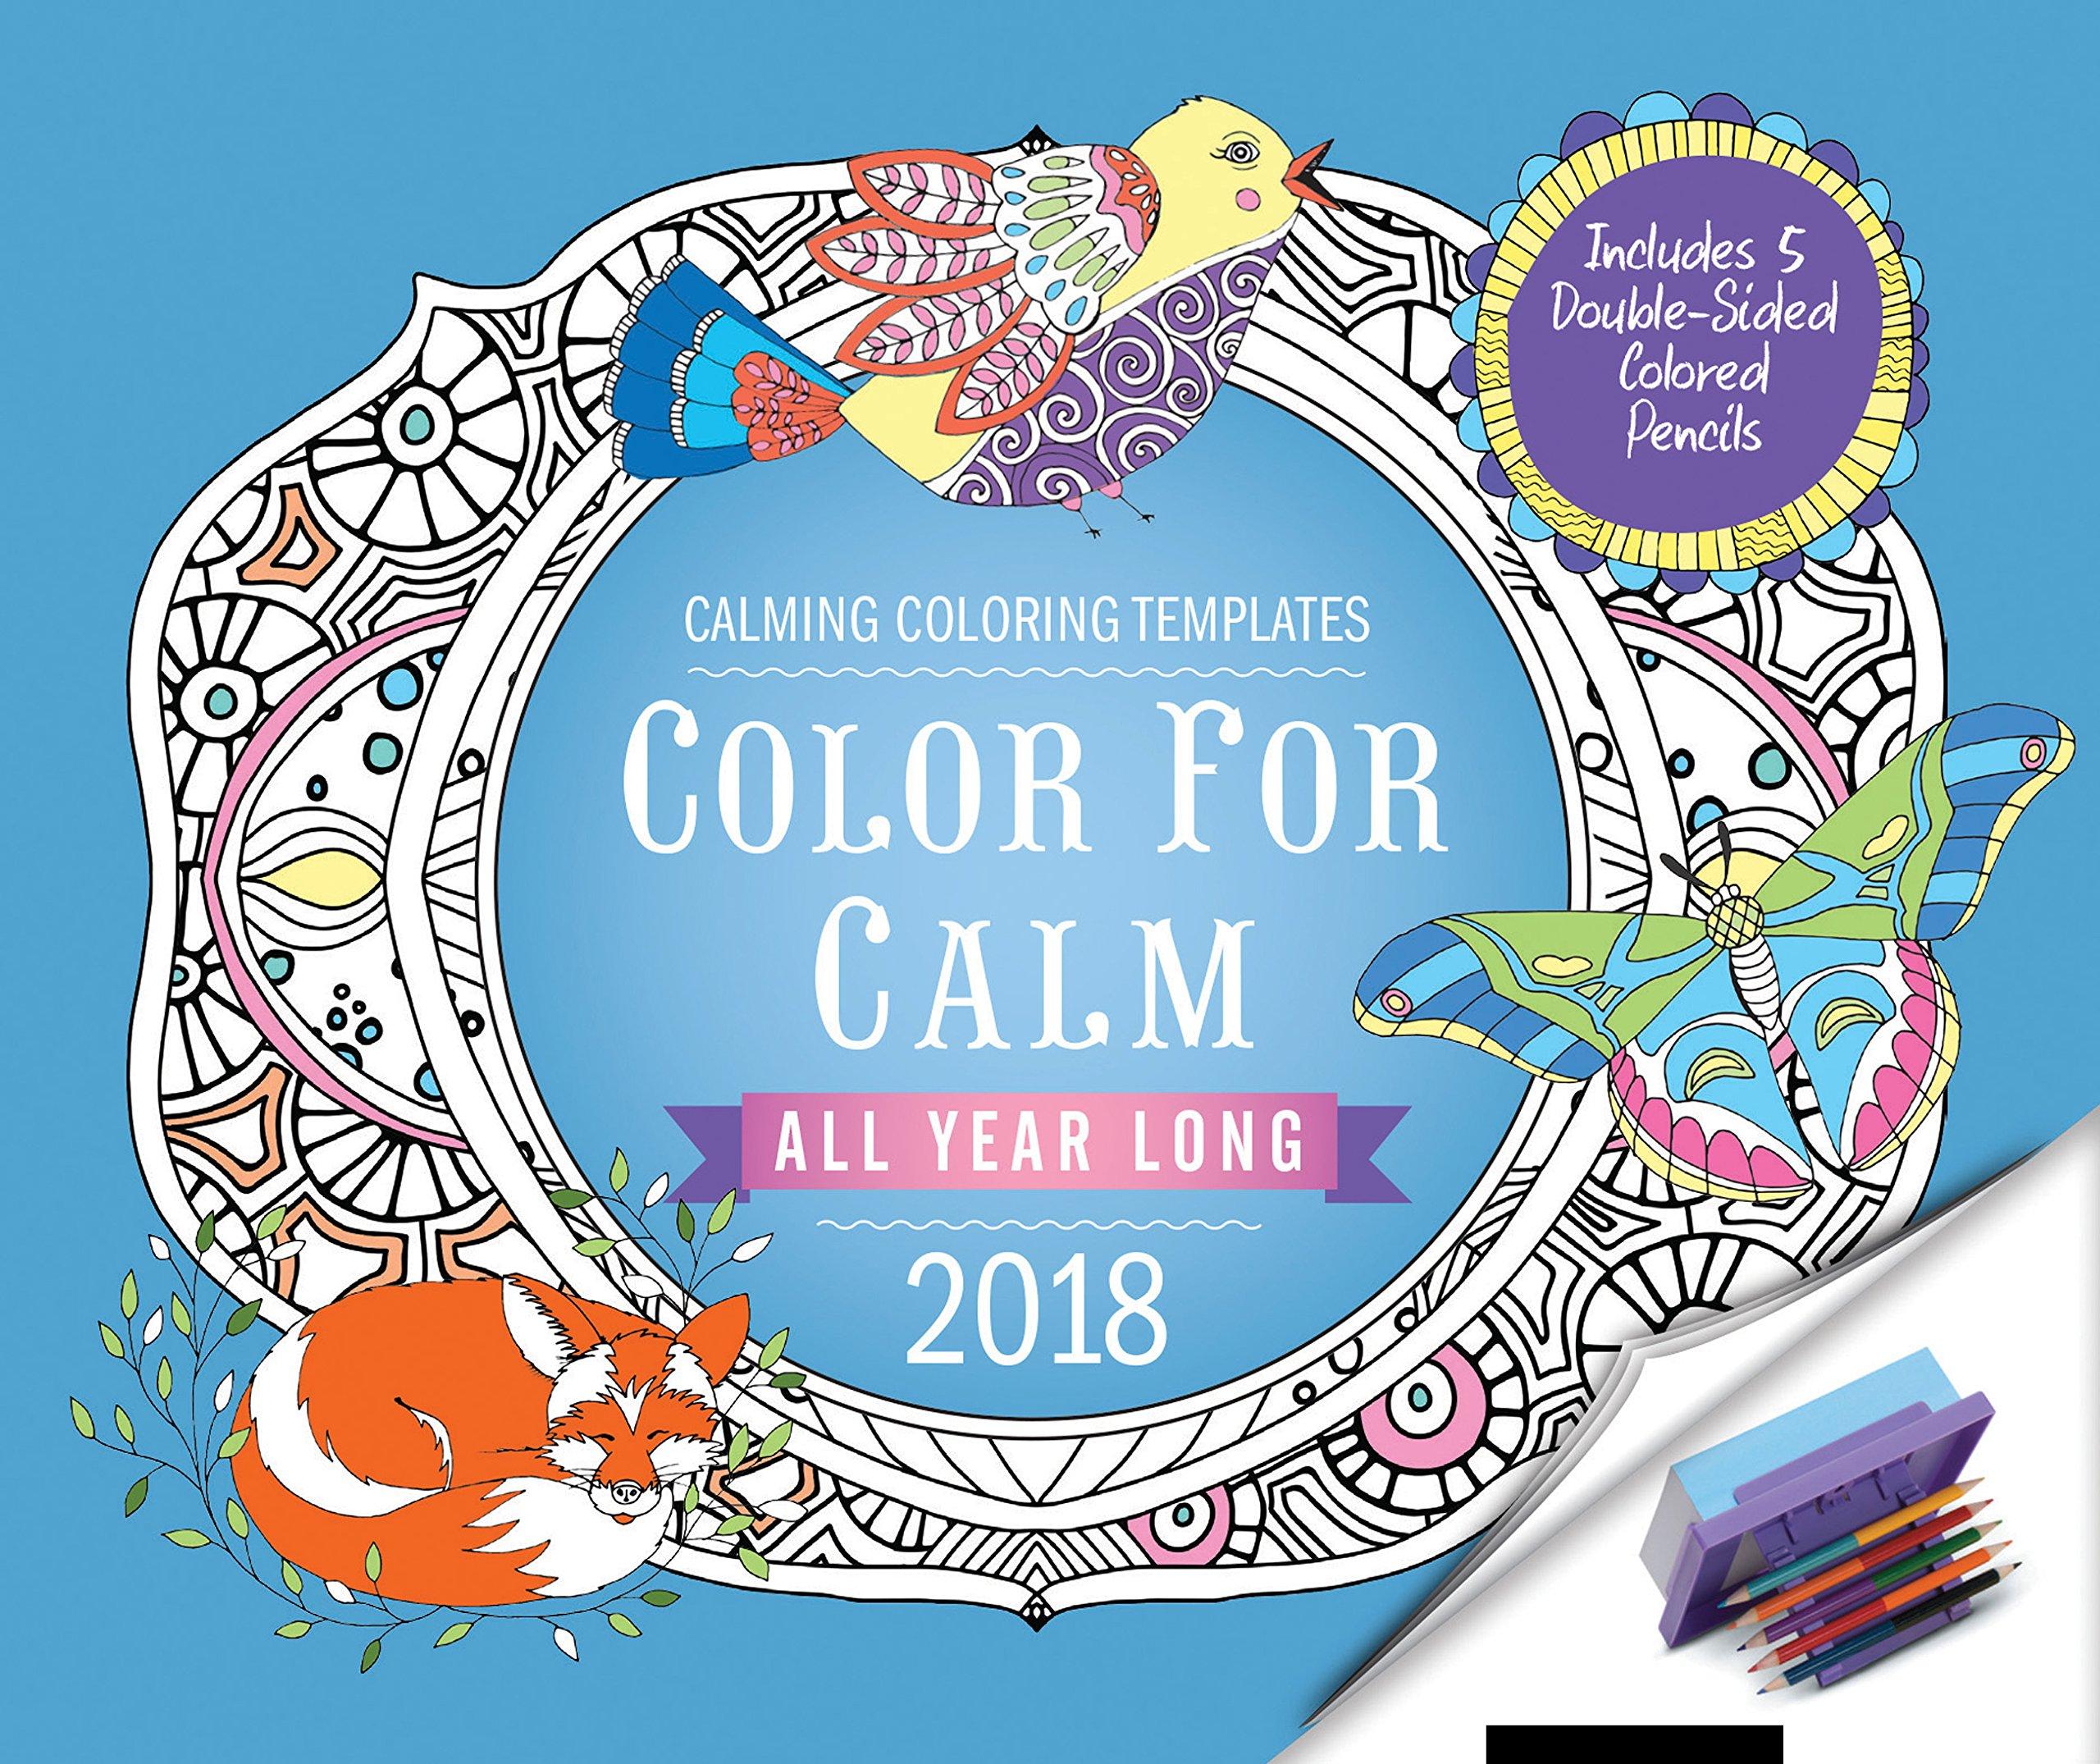 Amazon.com: Color for Calm All Year Long 2018: Box Calendar.